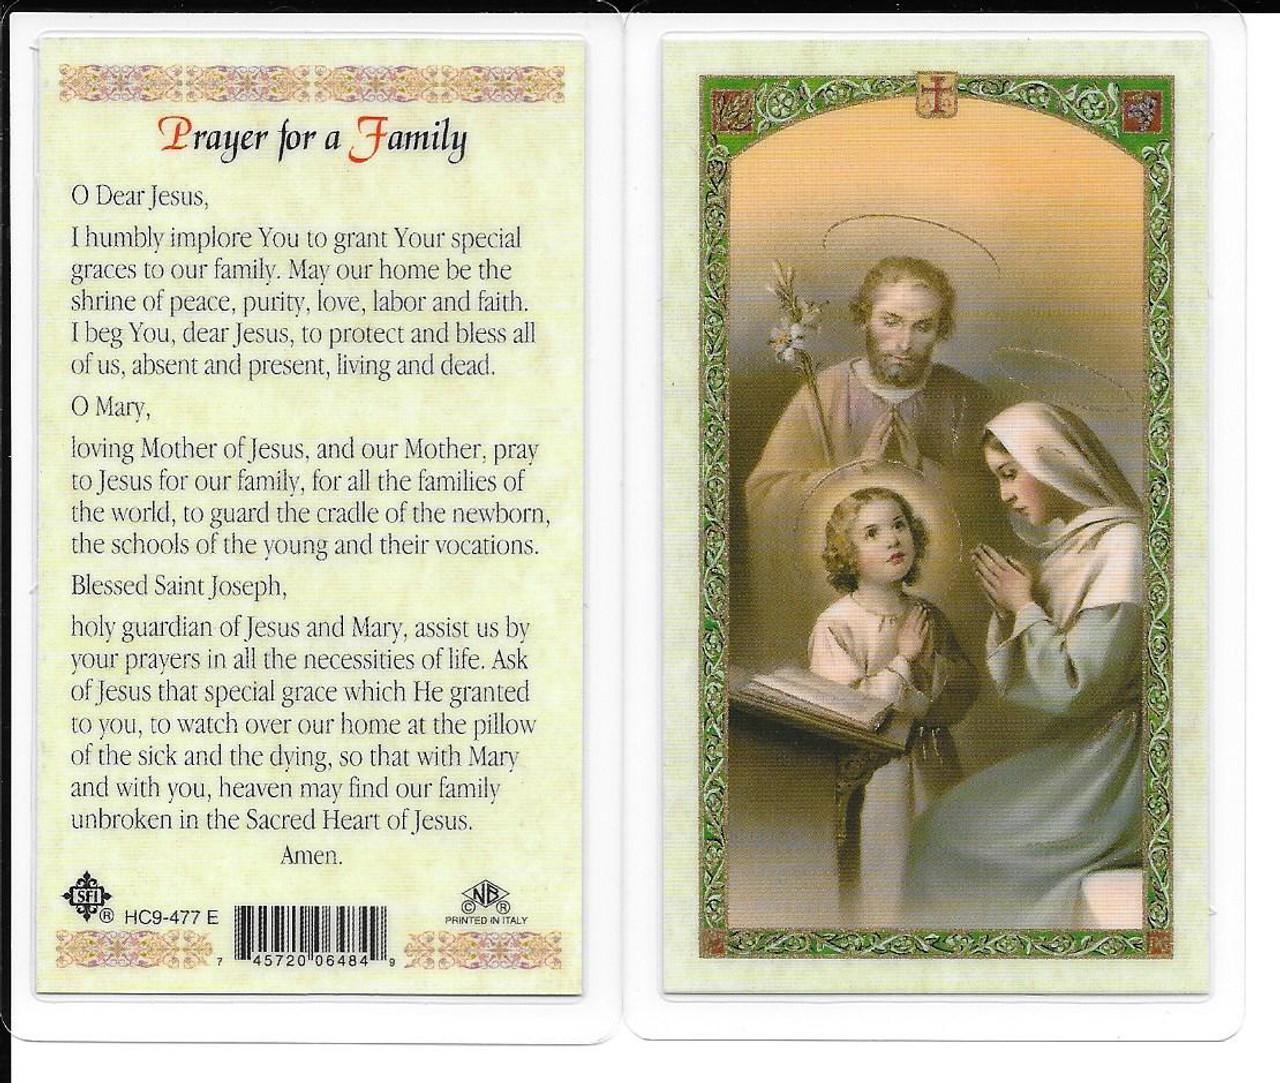 Laminated Prayer Card for a Family Prayer.